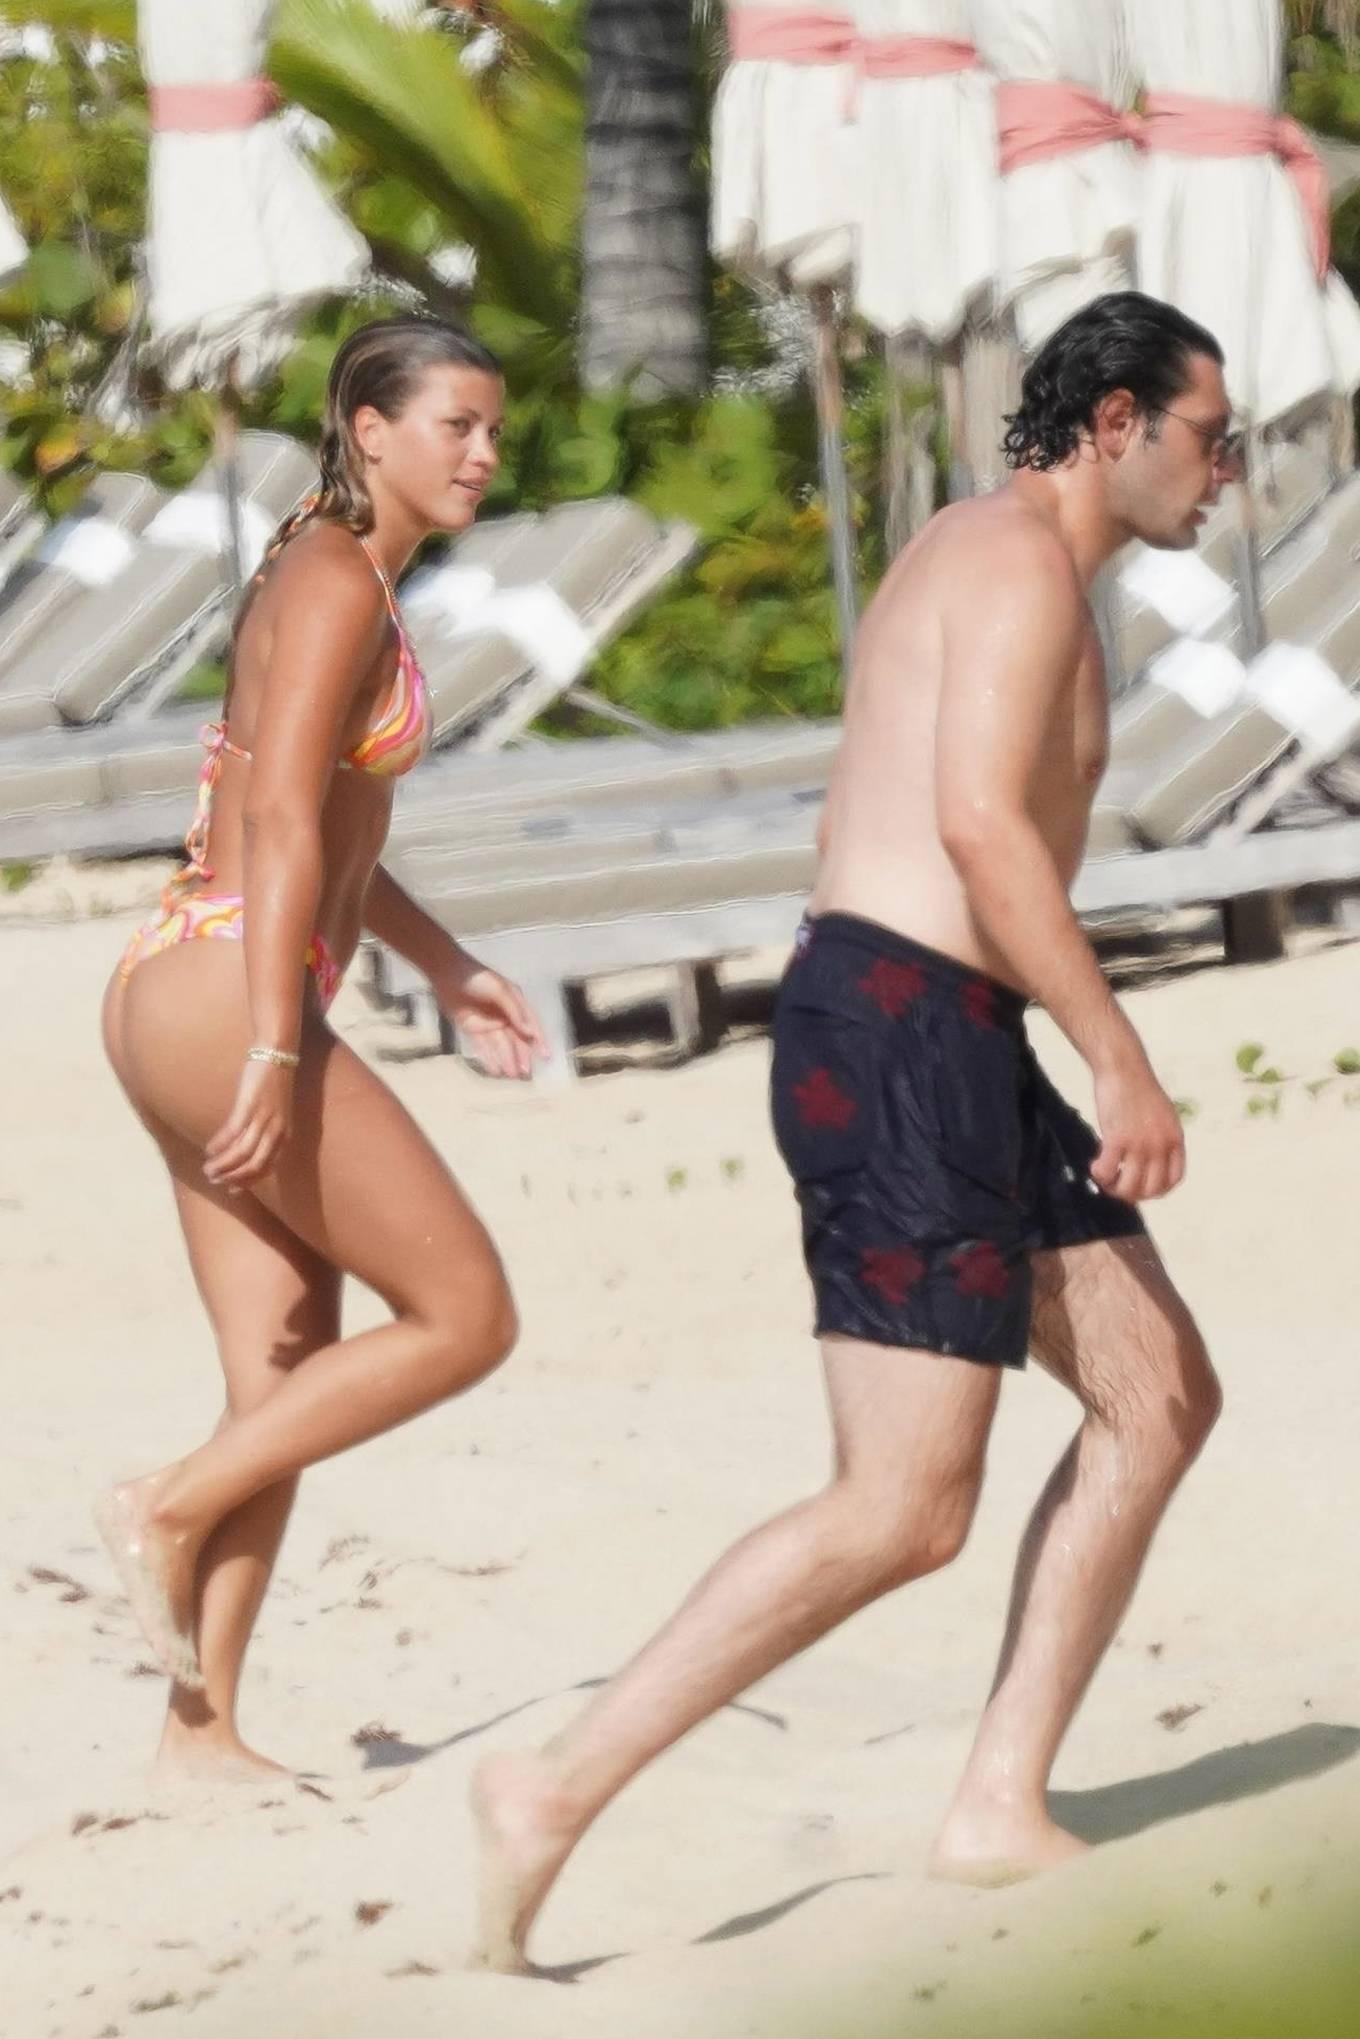 Sofia Richie - With new boyfriend Elliot Grainge in St Barts